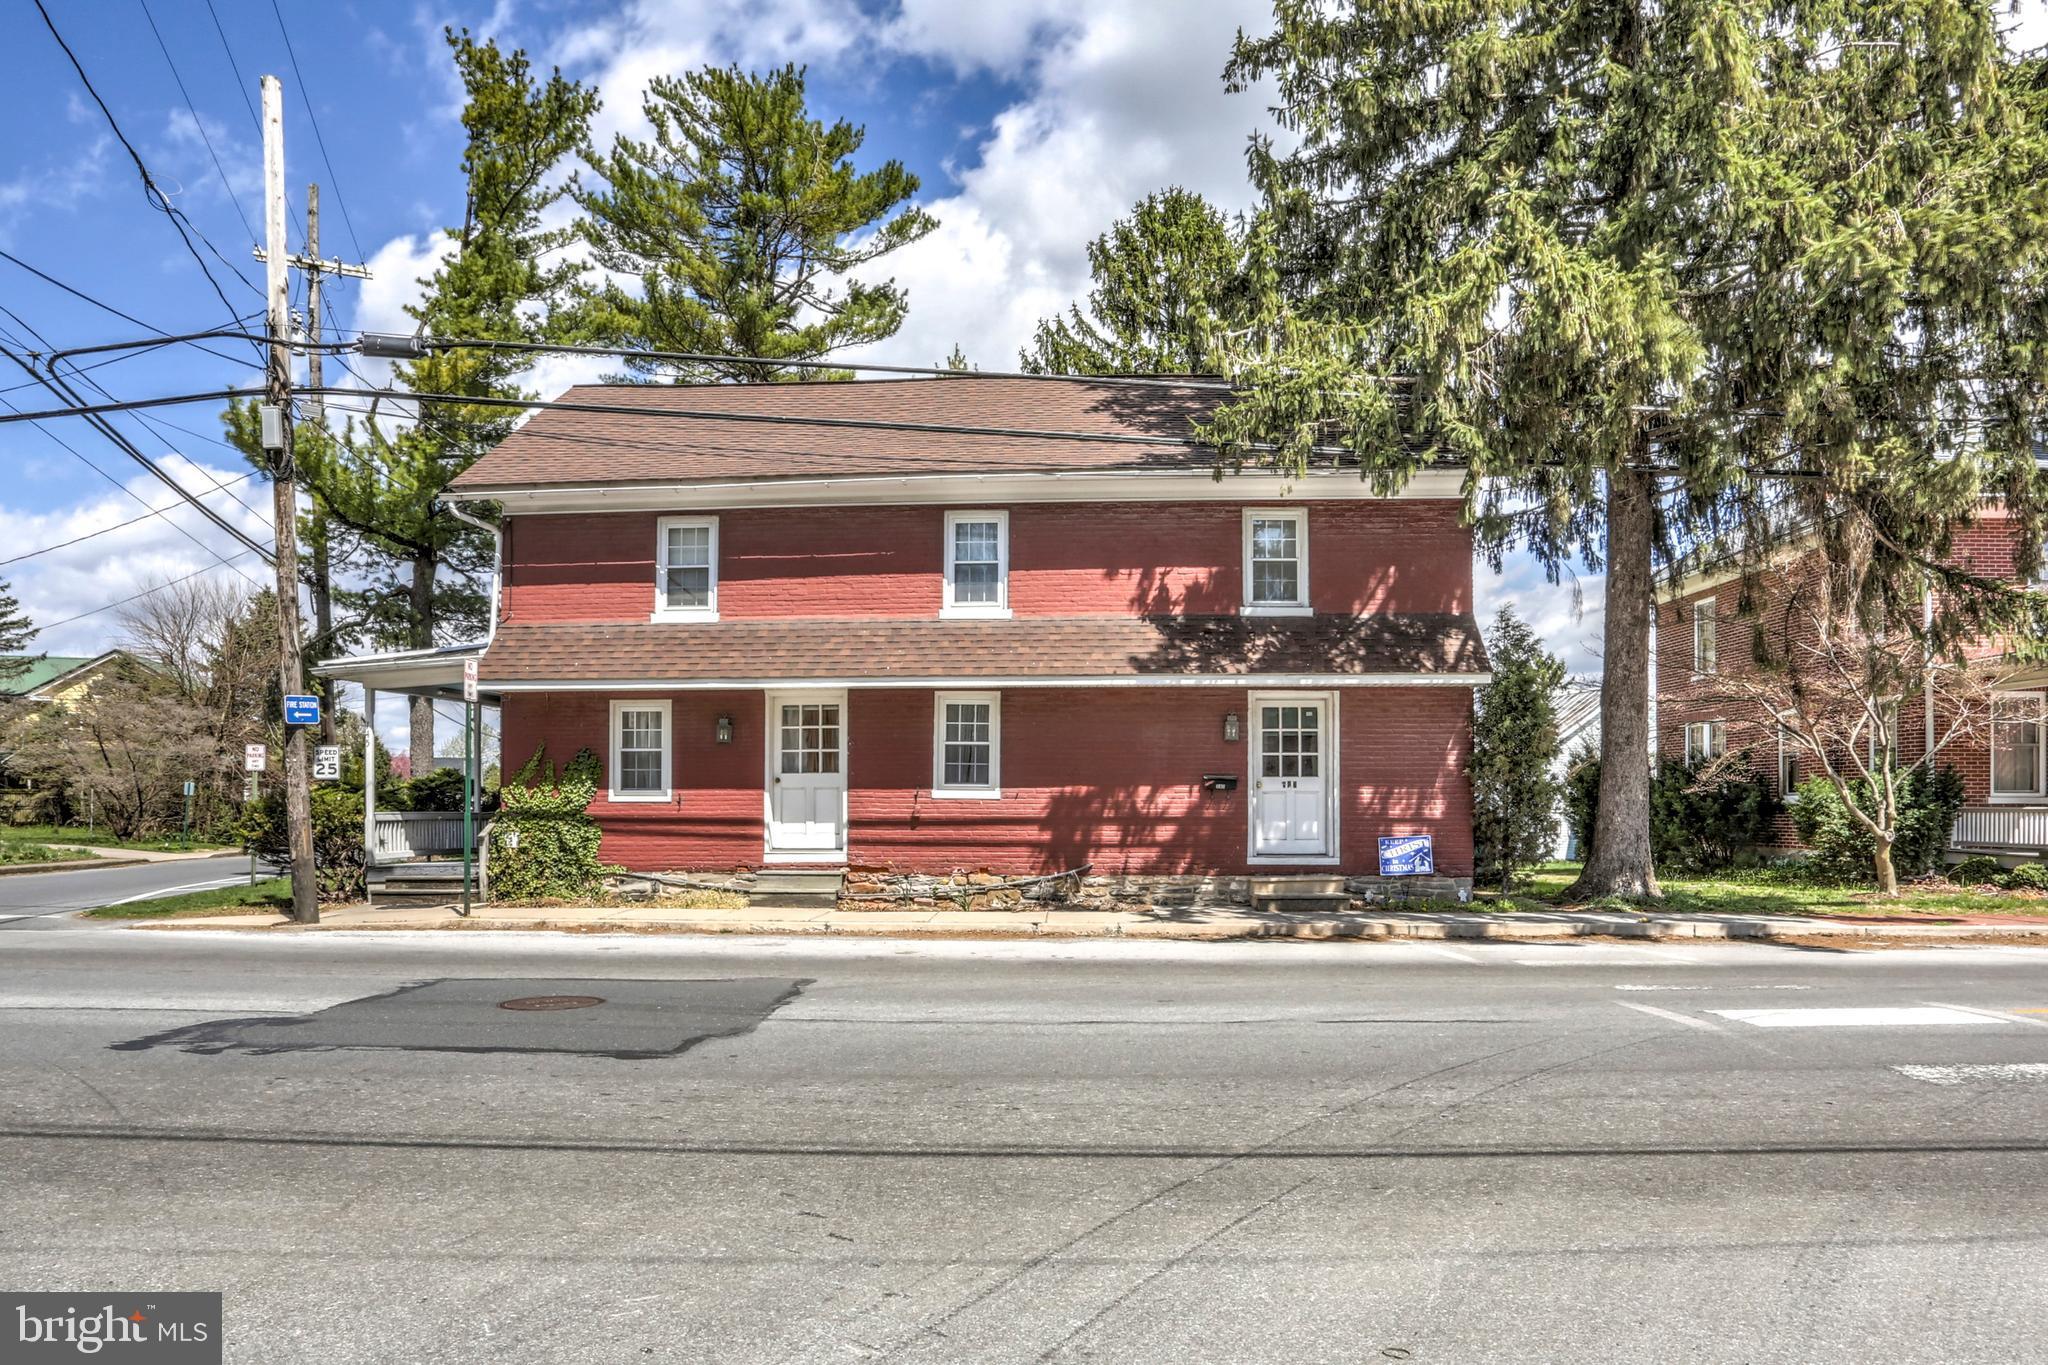 143-145 W MAIN STREET, STRASBURG, PA 17579